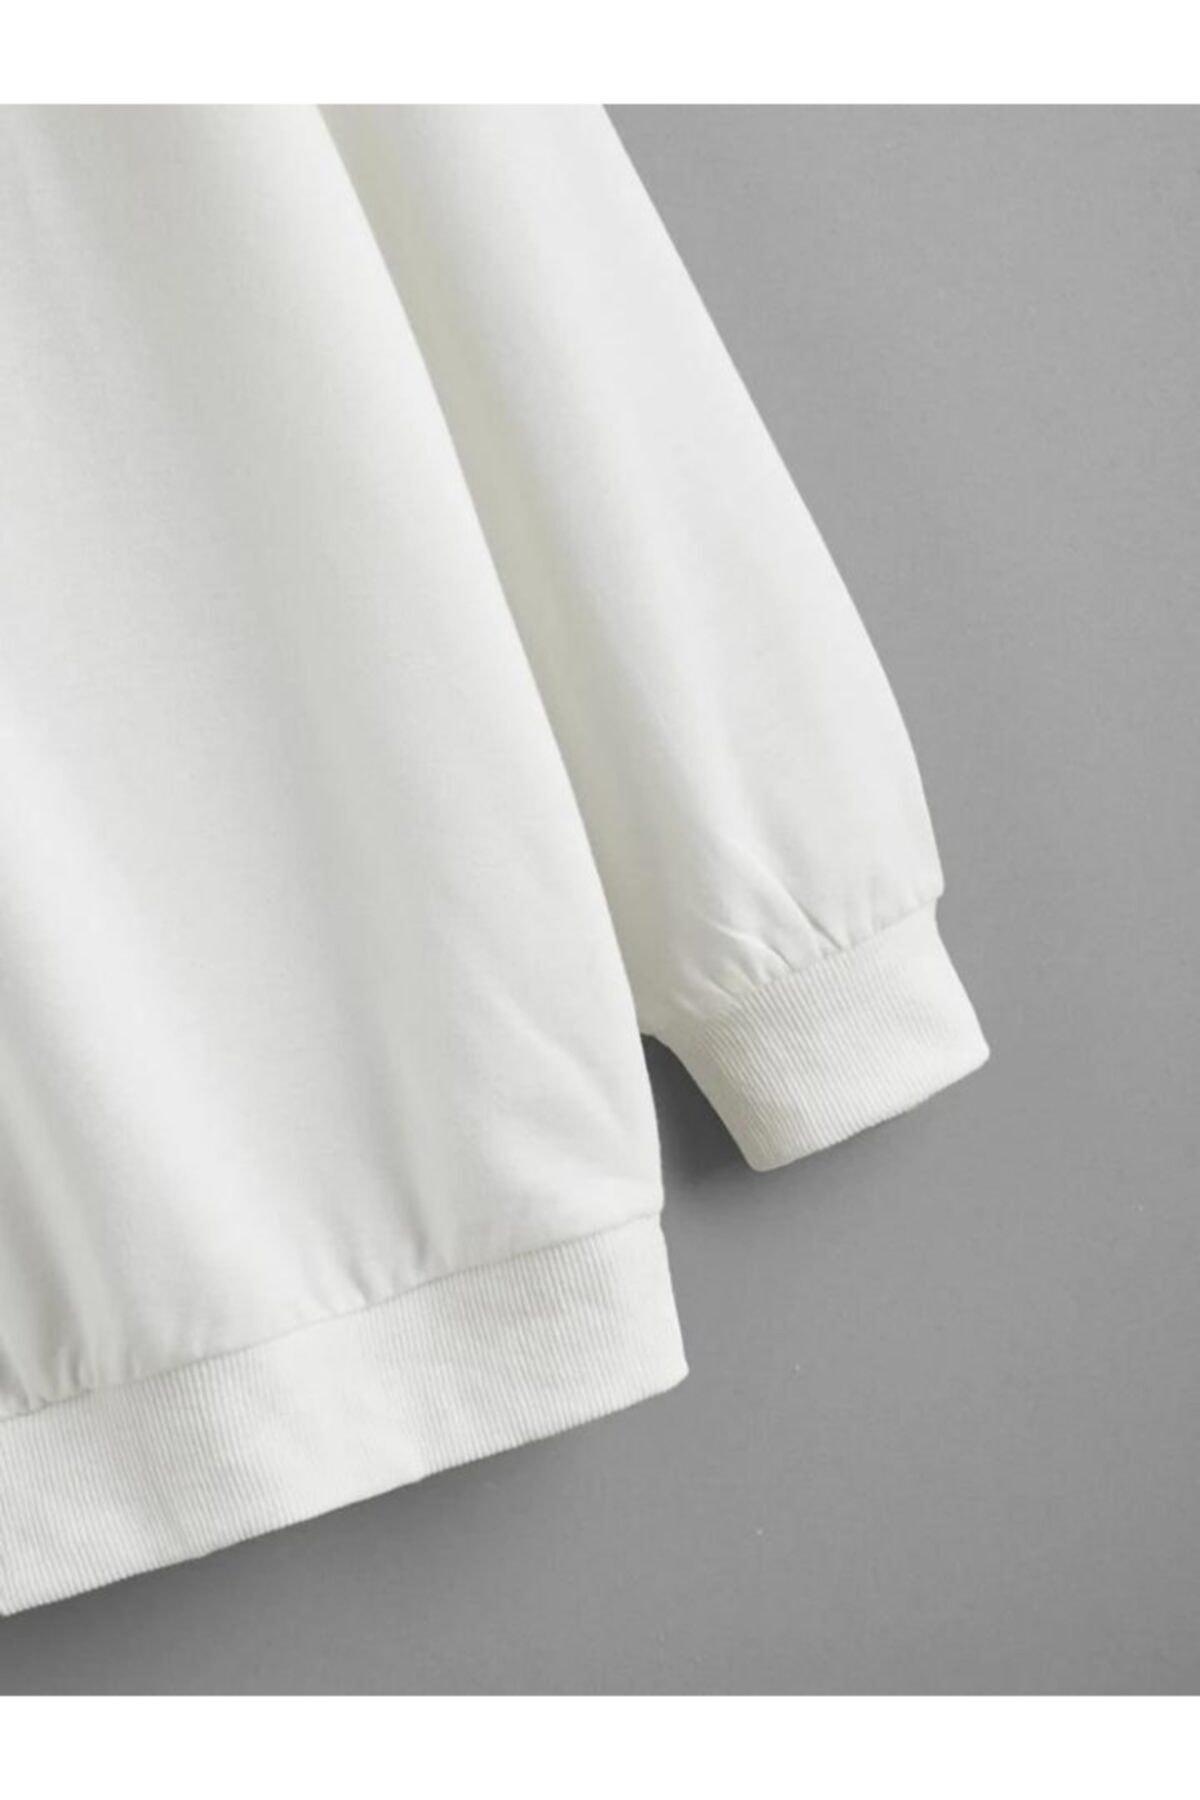 cartoonsshop Unisex Beyaz Düz Basic Sweatshirt 2